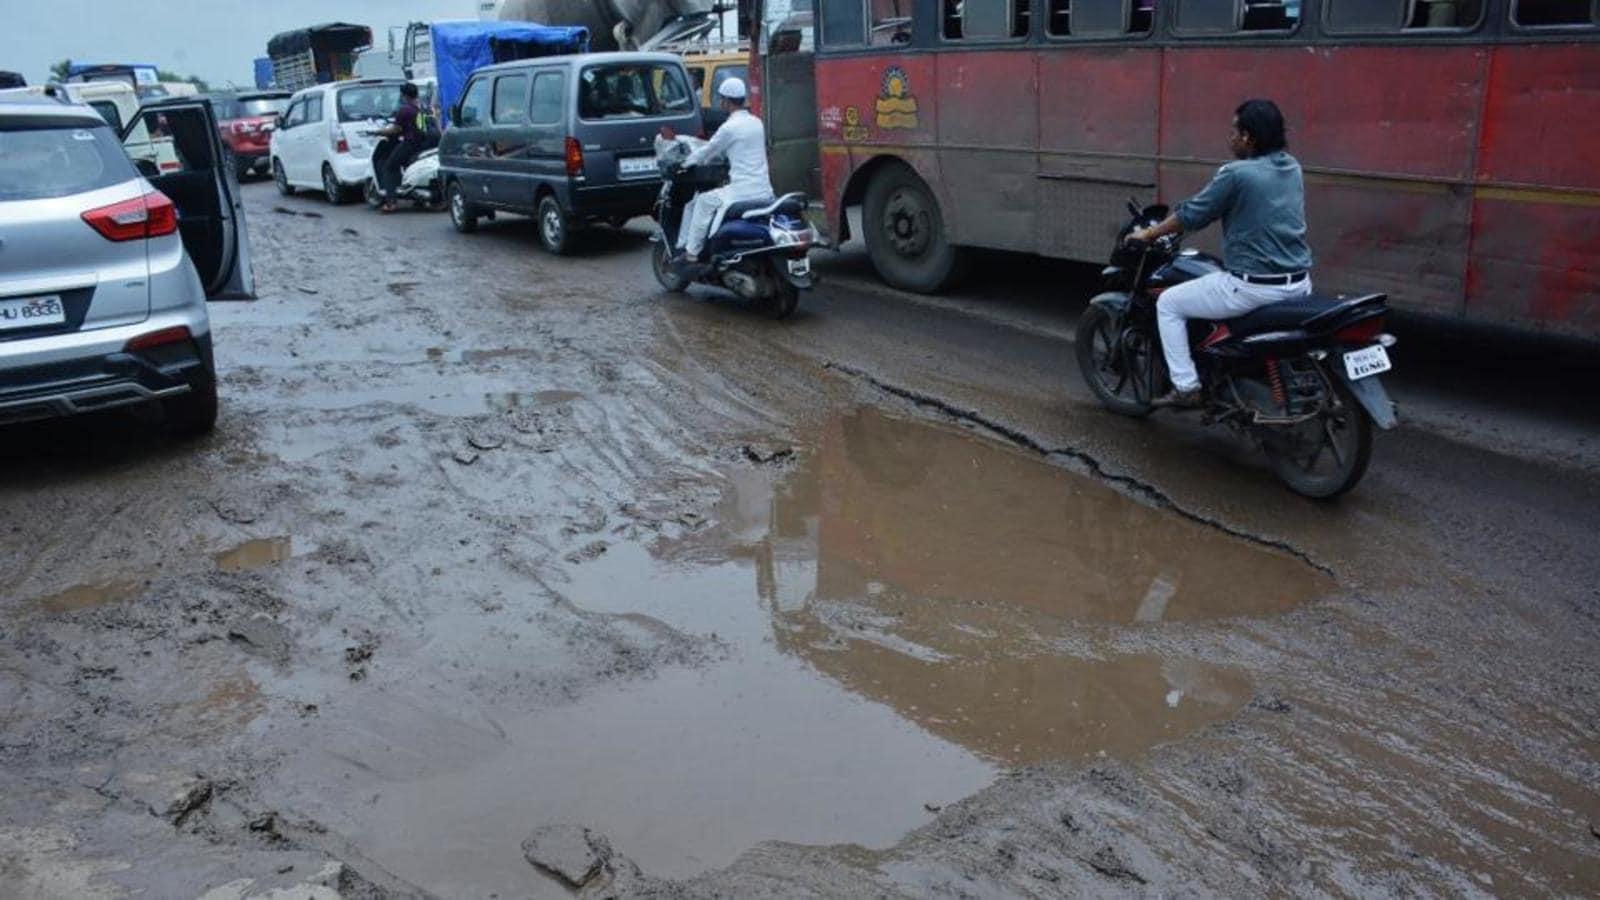 Pothole repair on highway between Mumbai and Nashik to be done by Oct 25: NHAI to Bombay HC